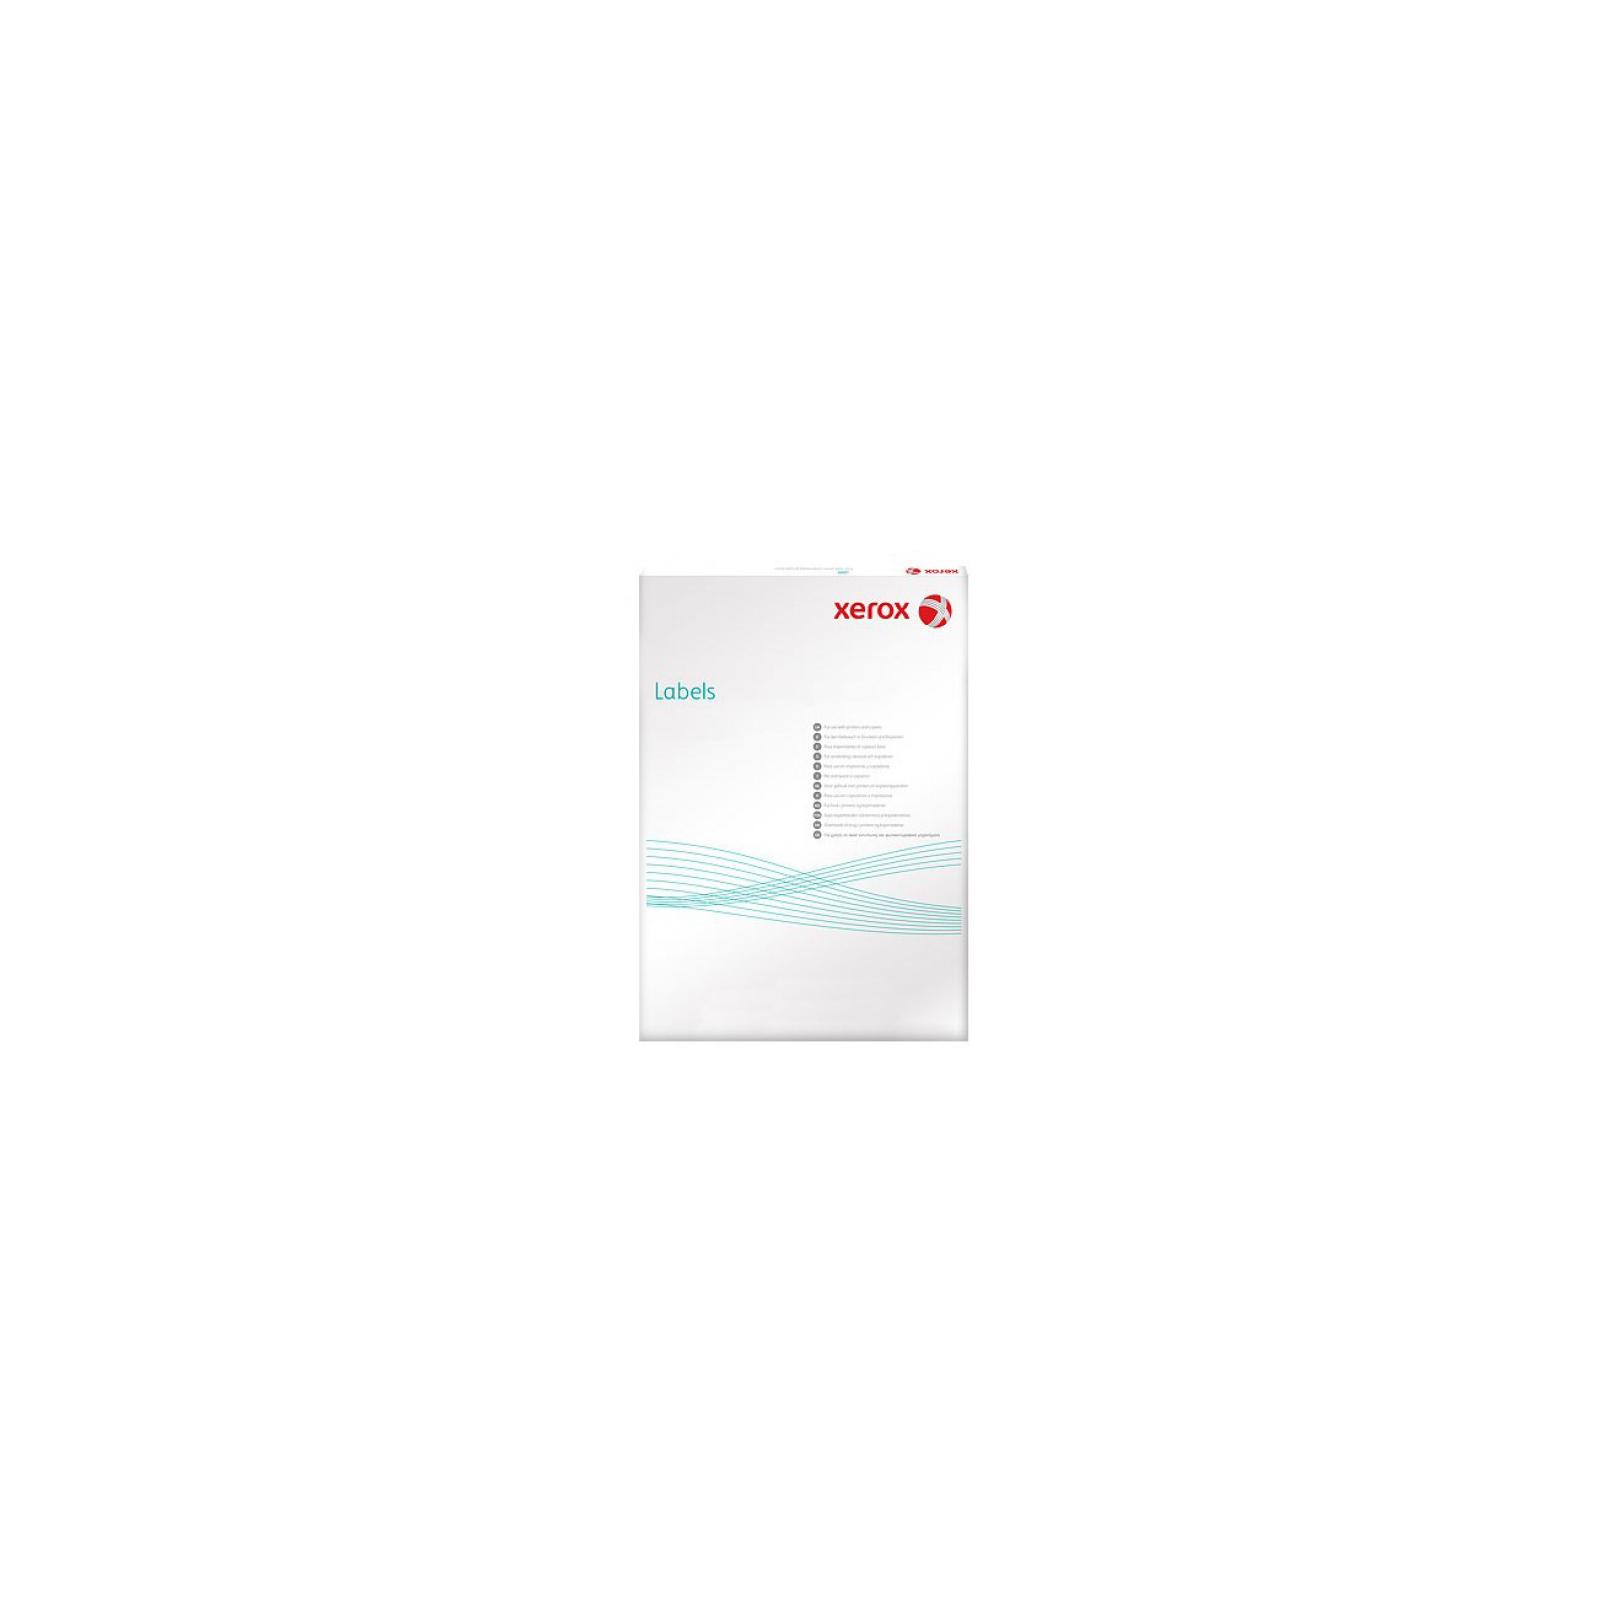 Етикетка самоклеюча Xerox 003R97402